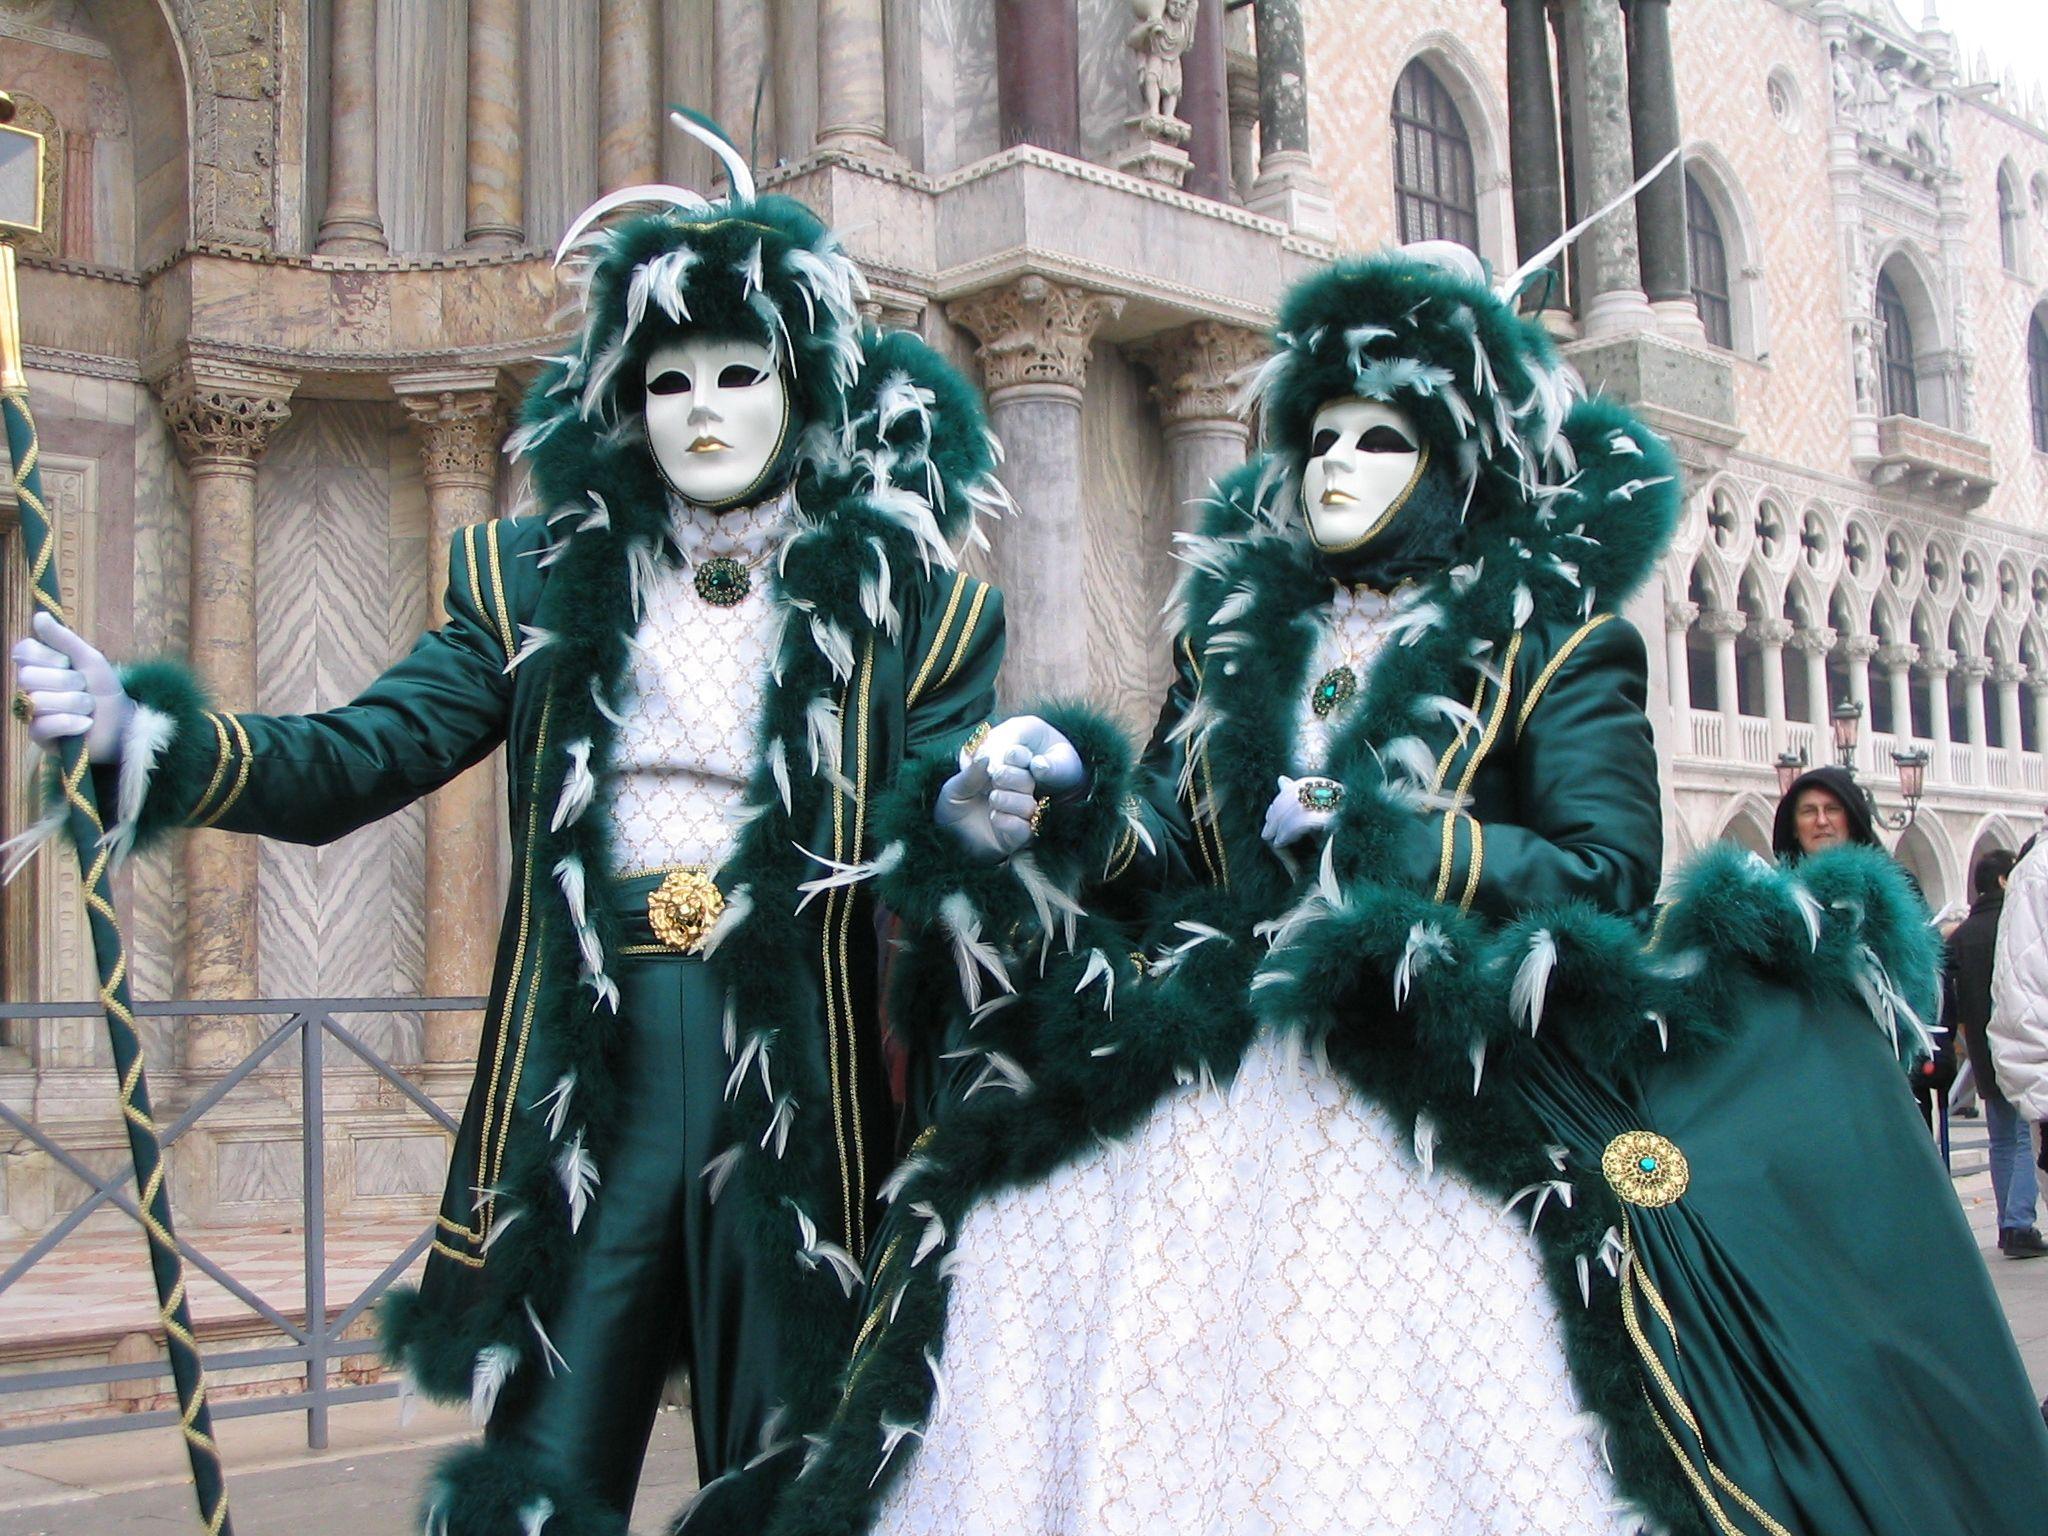 Carnaval, fantasias on Pinterest | Fantasia, Carnival